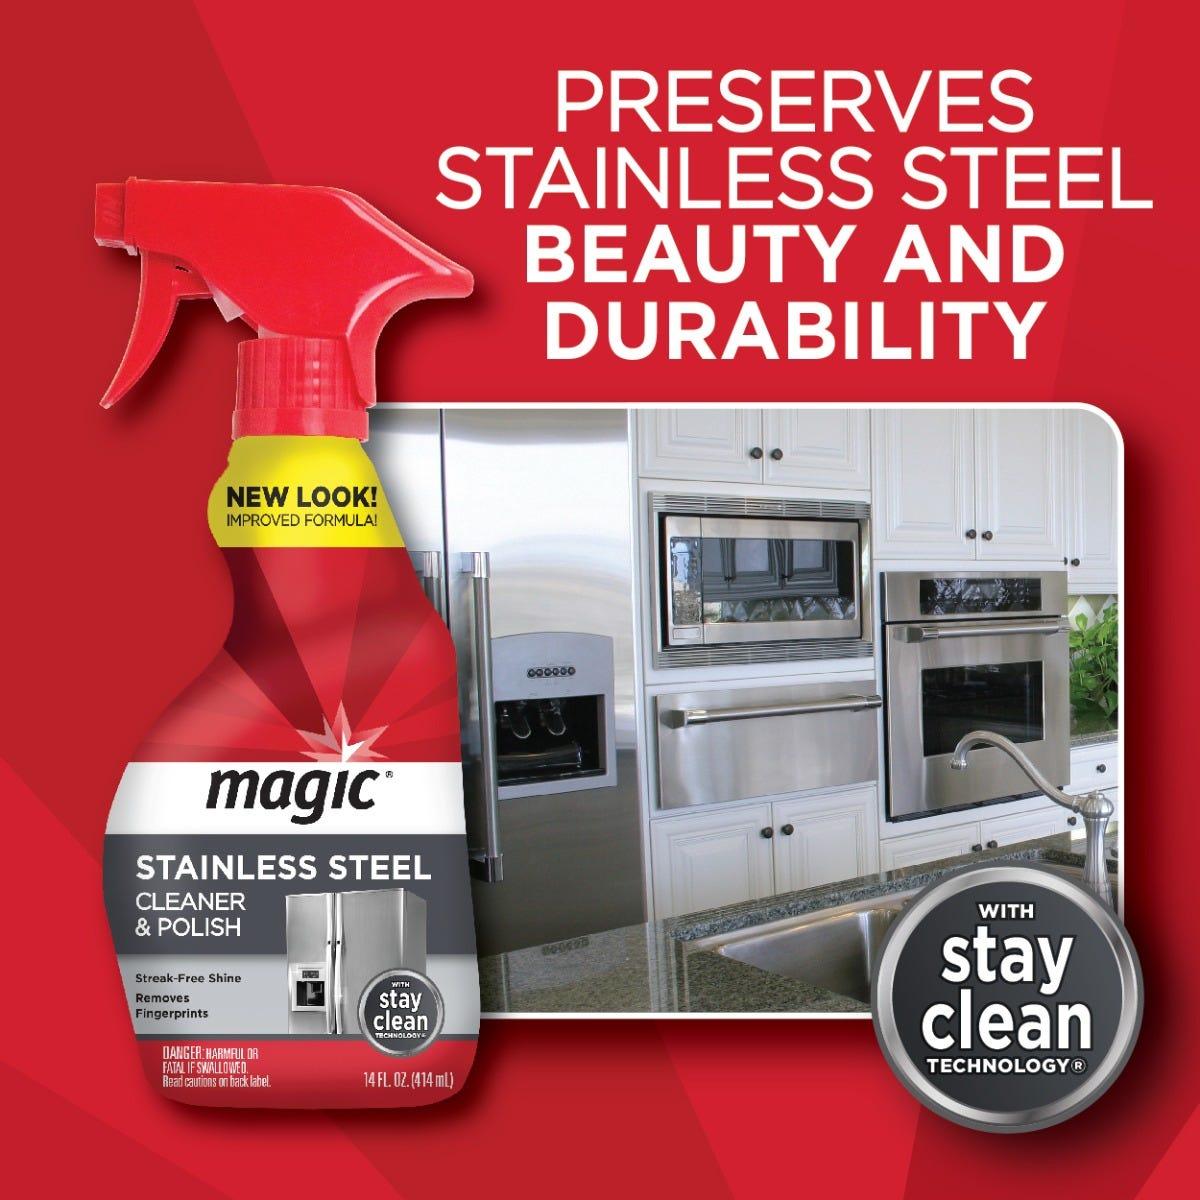 https://googone.com/media/catalog/product/m/a/magic_stainless_steel_cleaner_spray_beauty_1_1.jpg